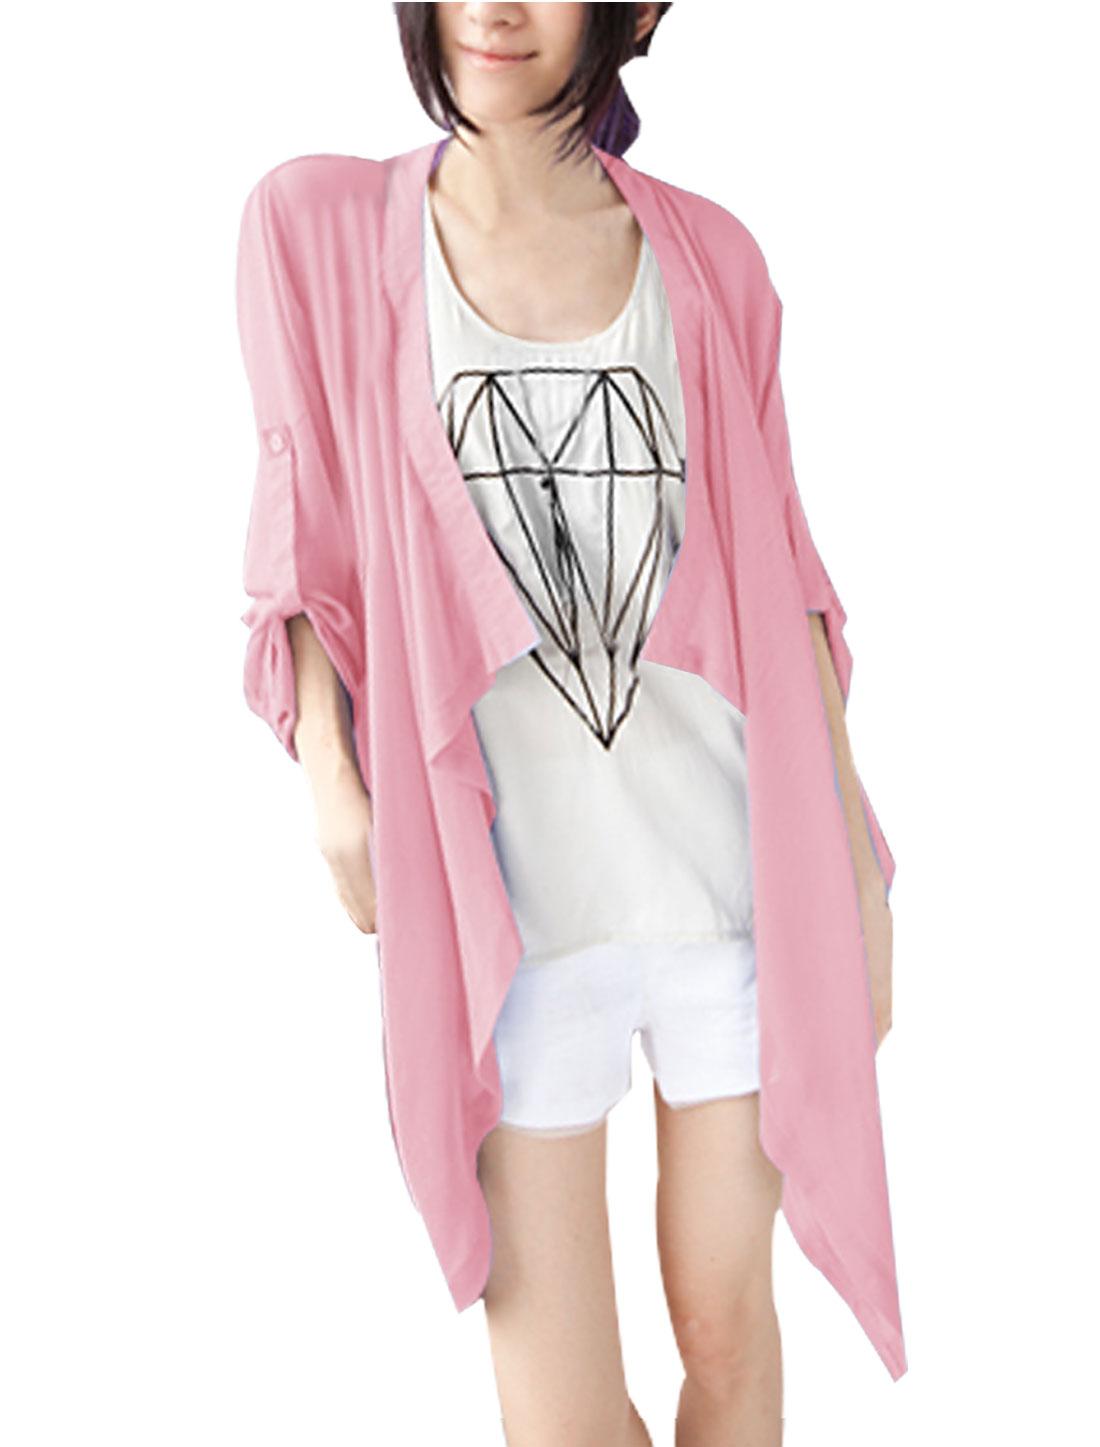 Women Semi Sheer Roll Up Sleeves Irregular Hem Chiffon Coat Pink XS